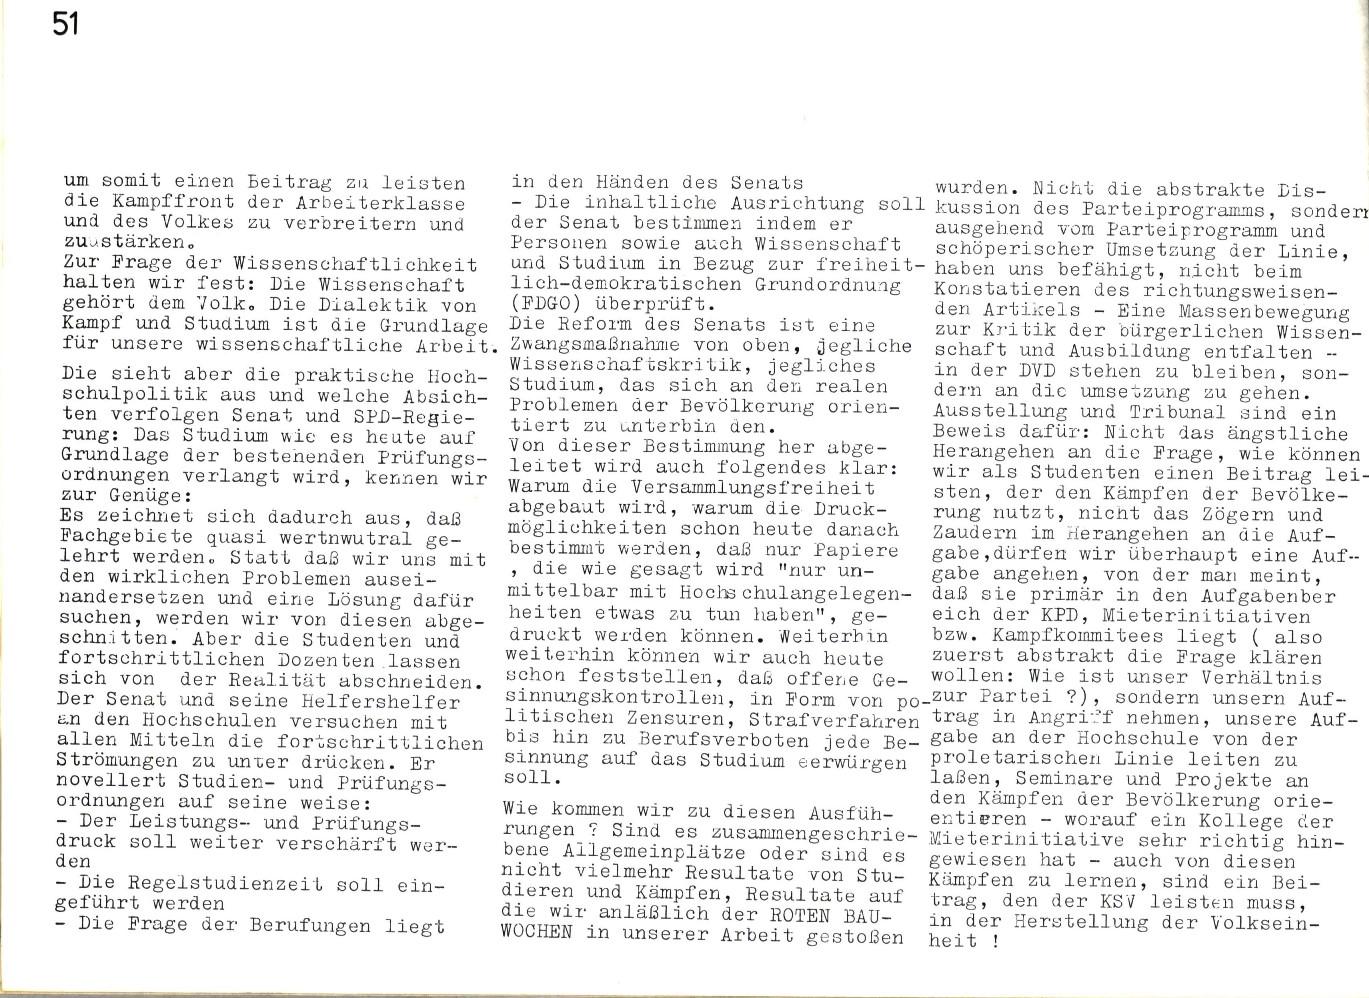 Berlin_KSV_1974_Rote_Bauwochen_68